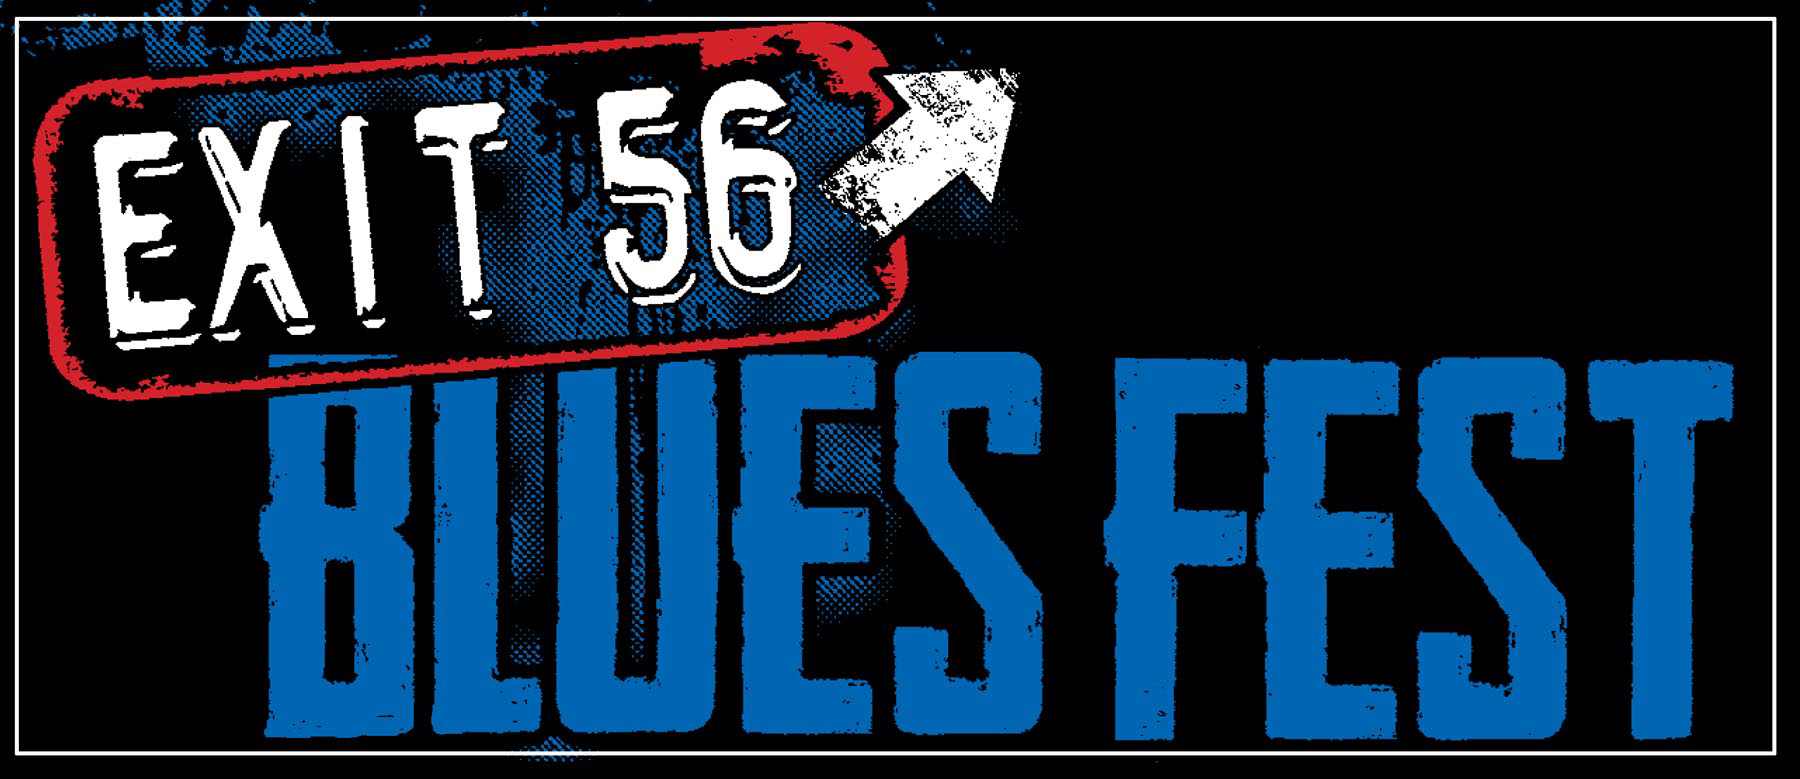 E56 Blues Fest